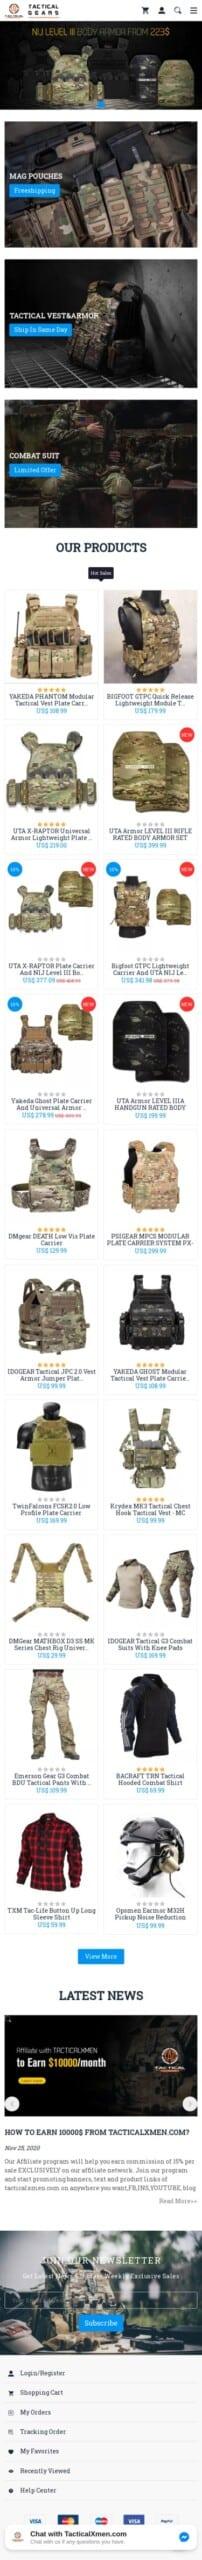 Tacticalxmen.com Coupon